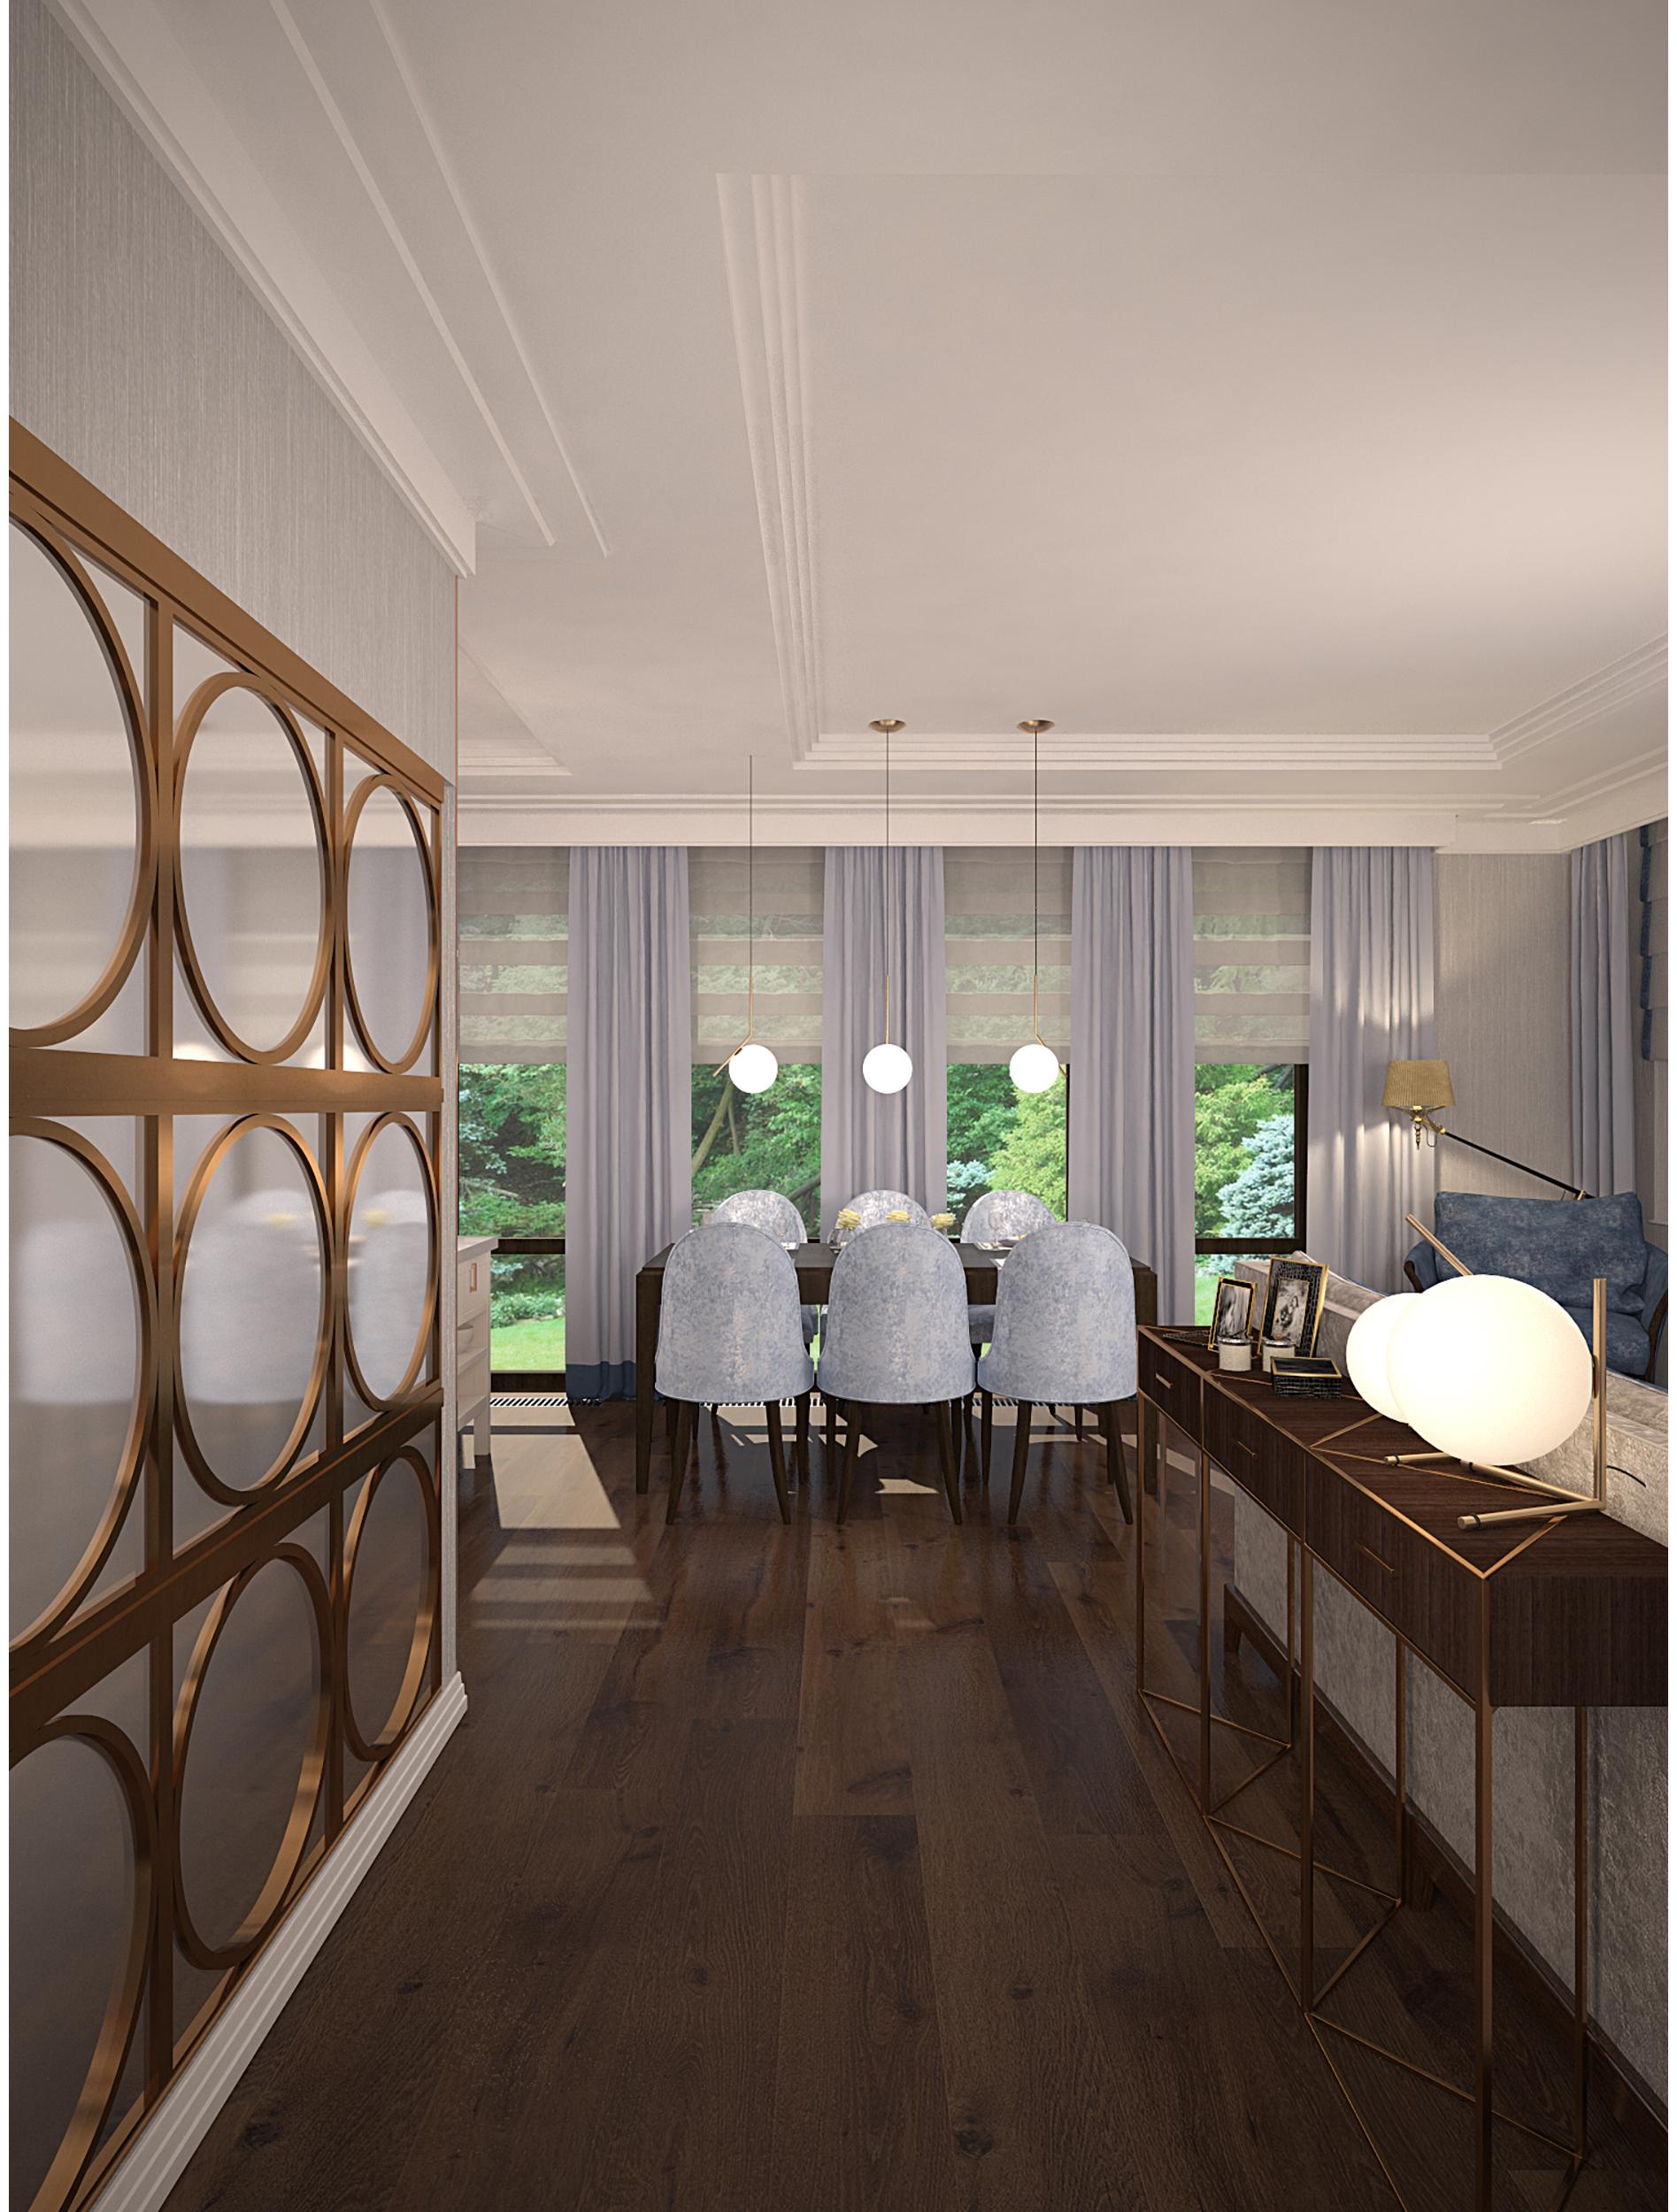 Copy of Living room. Contemporary art deco style interior.